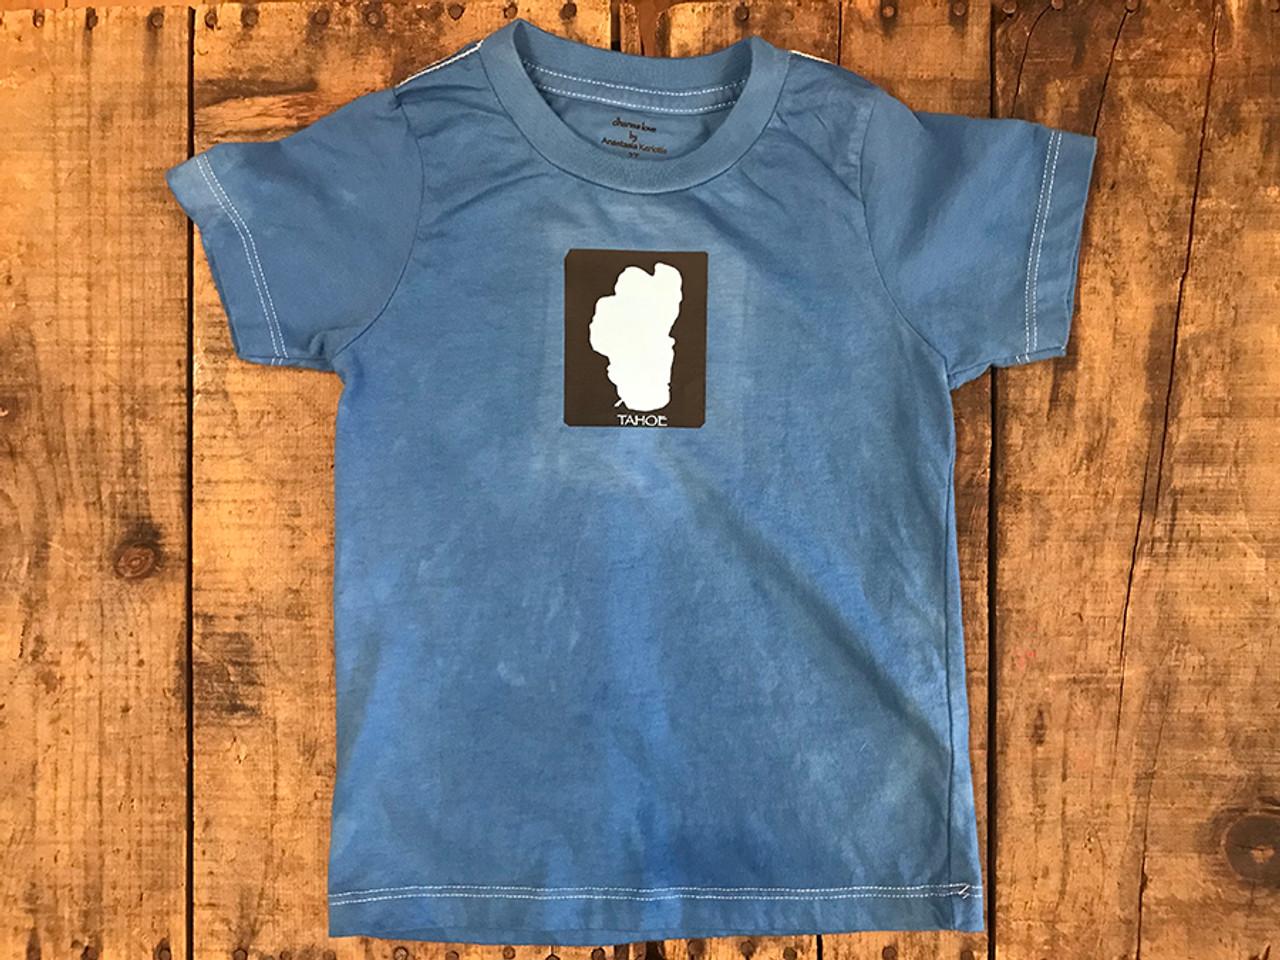 5009d3059879 Lake Tahoe Certified Organic Cotton Kids T-Shirt - Dharma Love